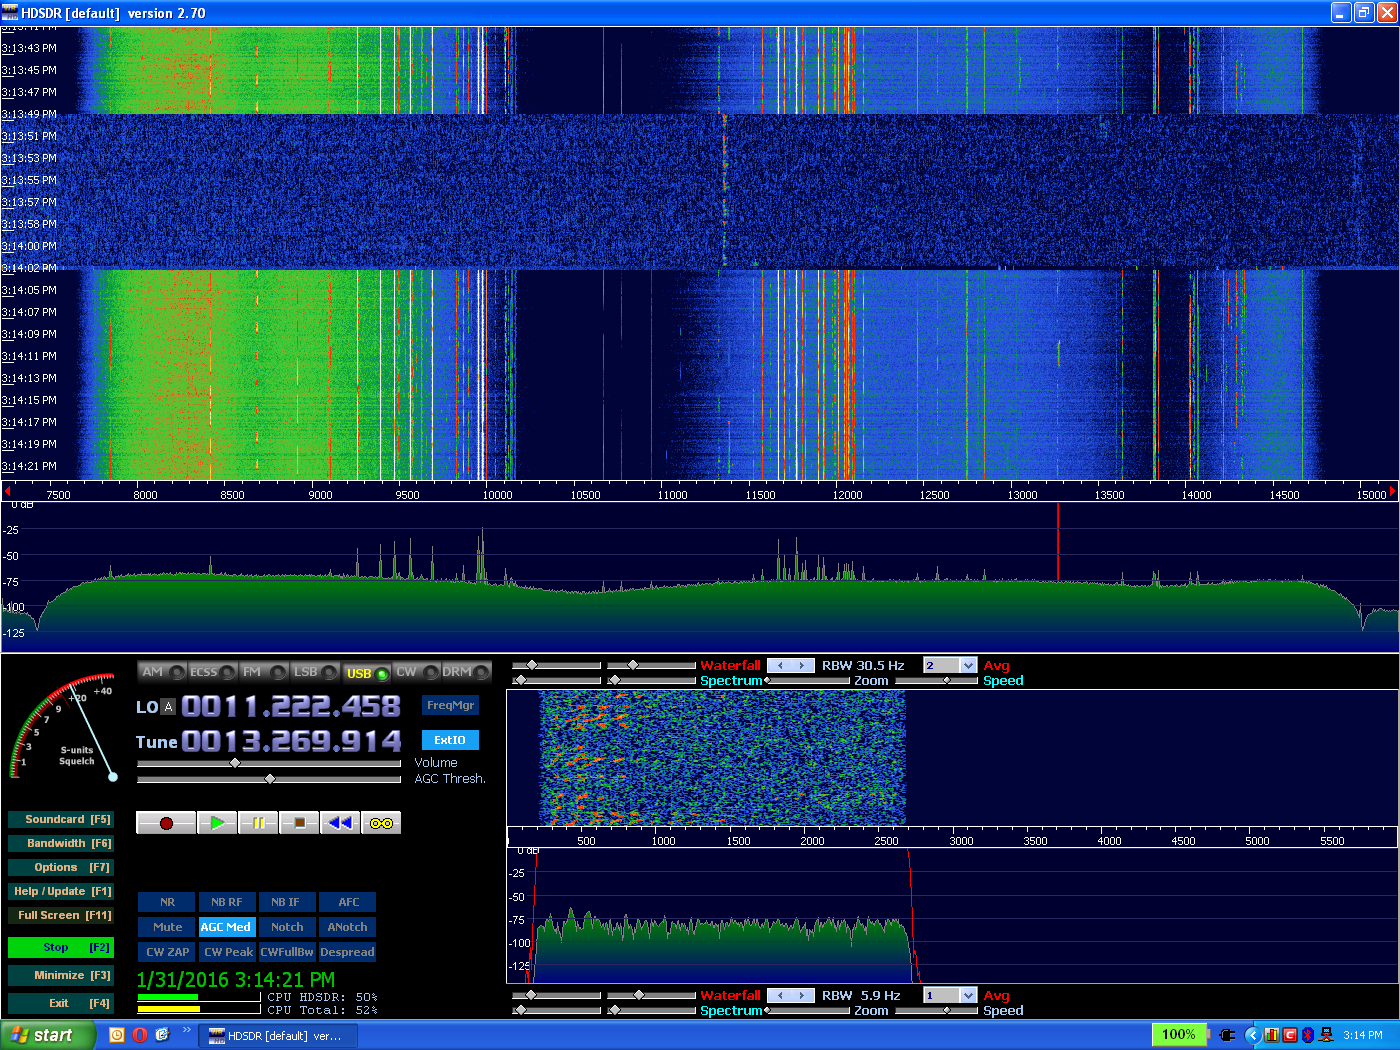 IC-7300 Adjustable Spectrum Scale